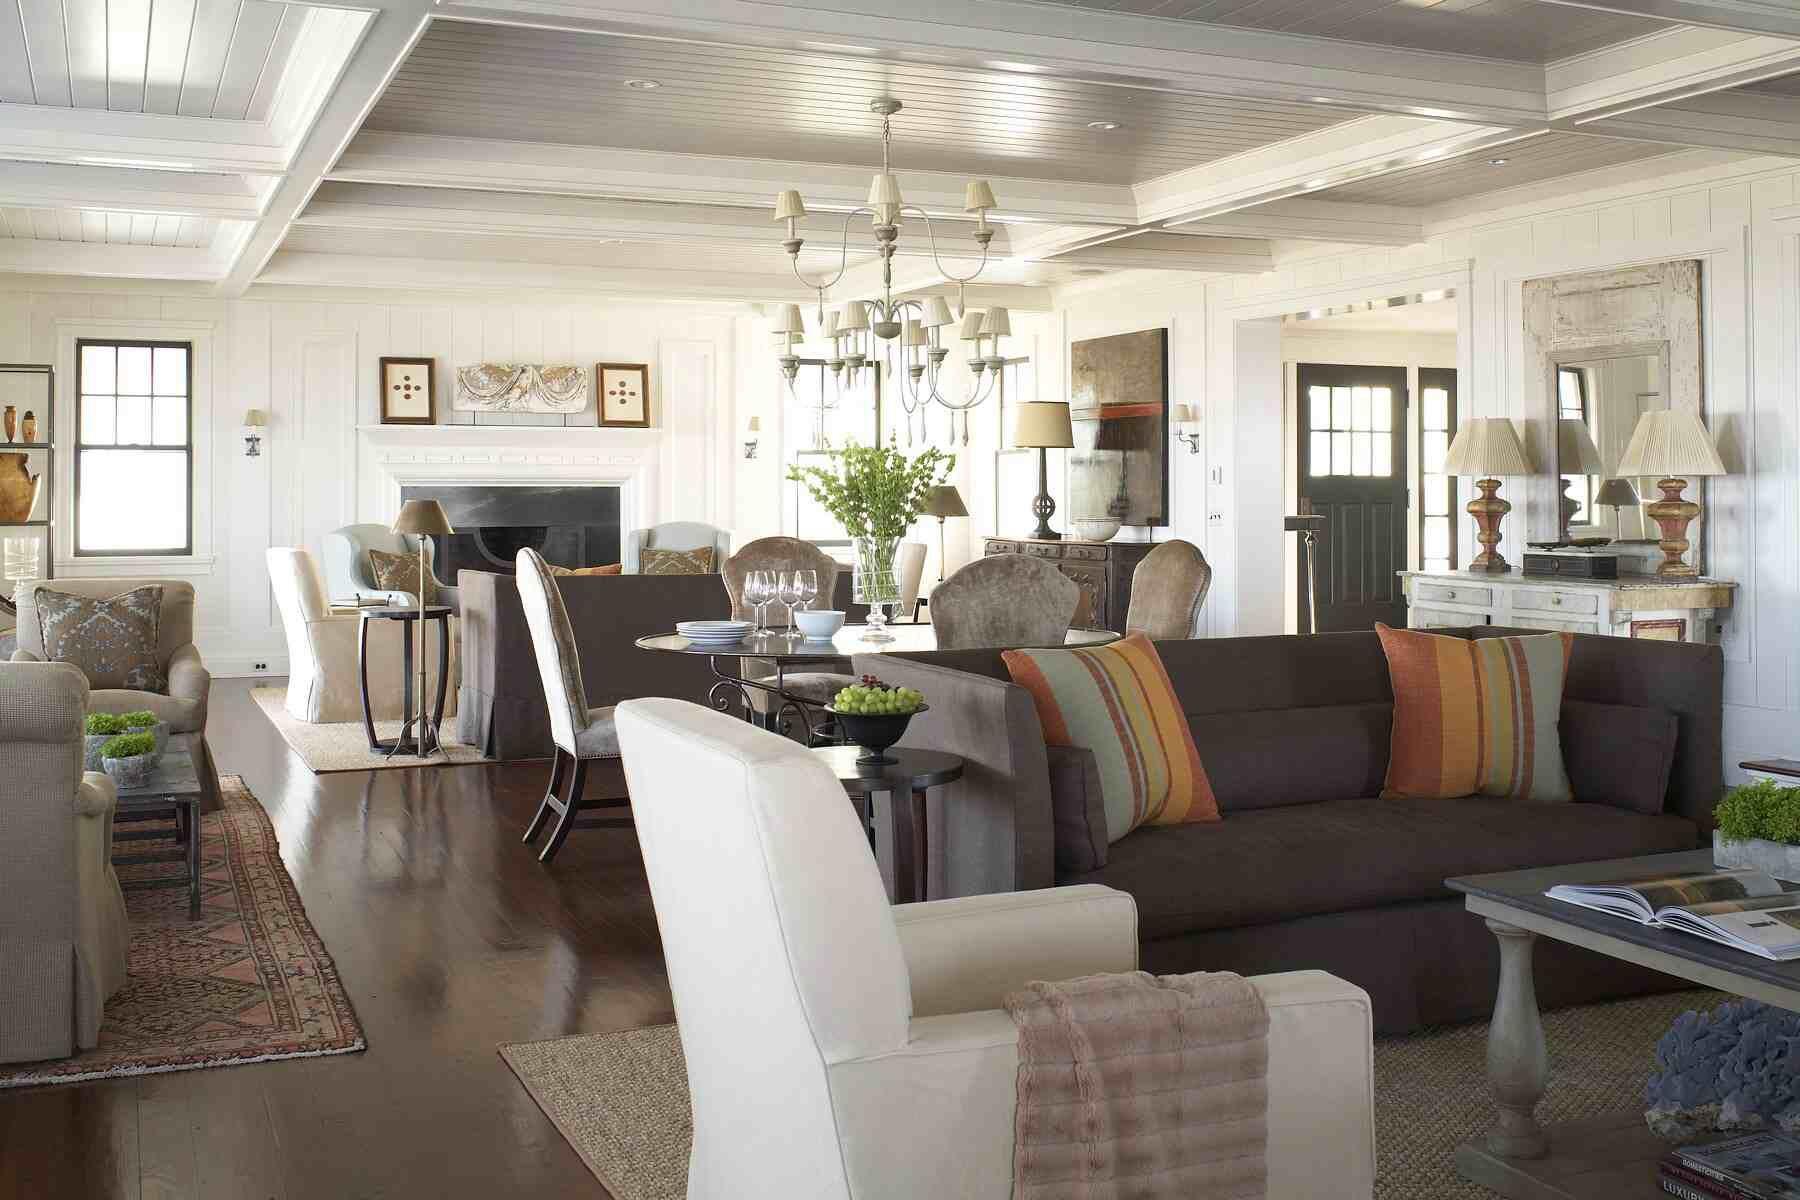 02haslam New England Style Homes